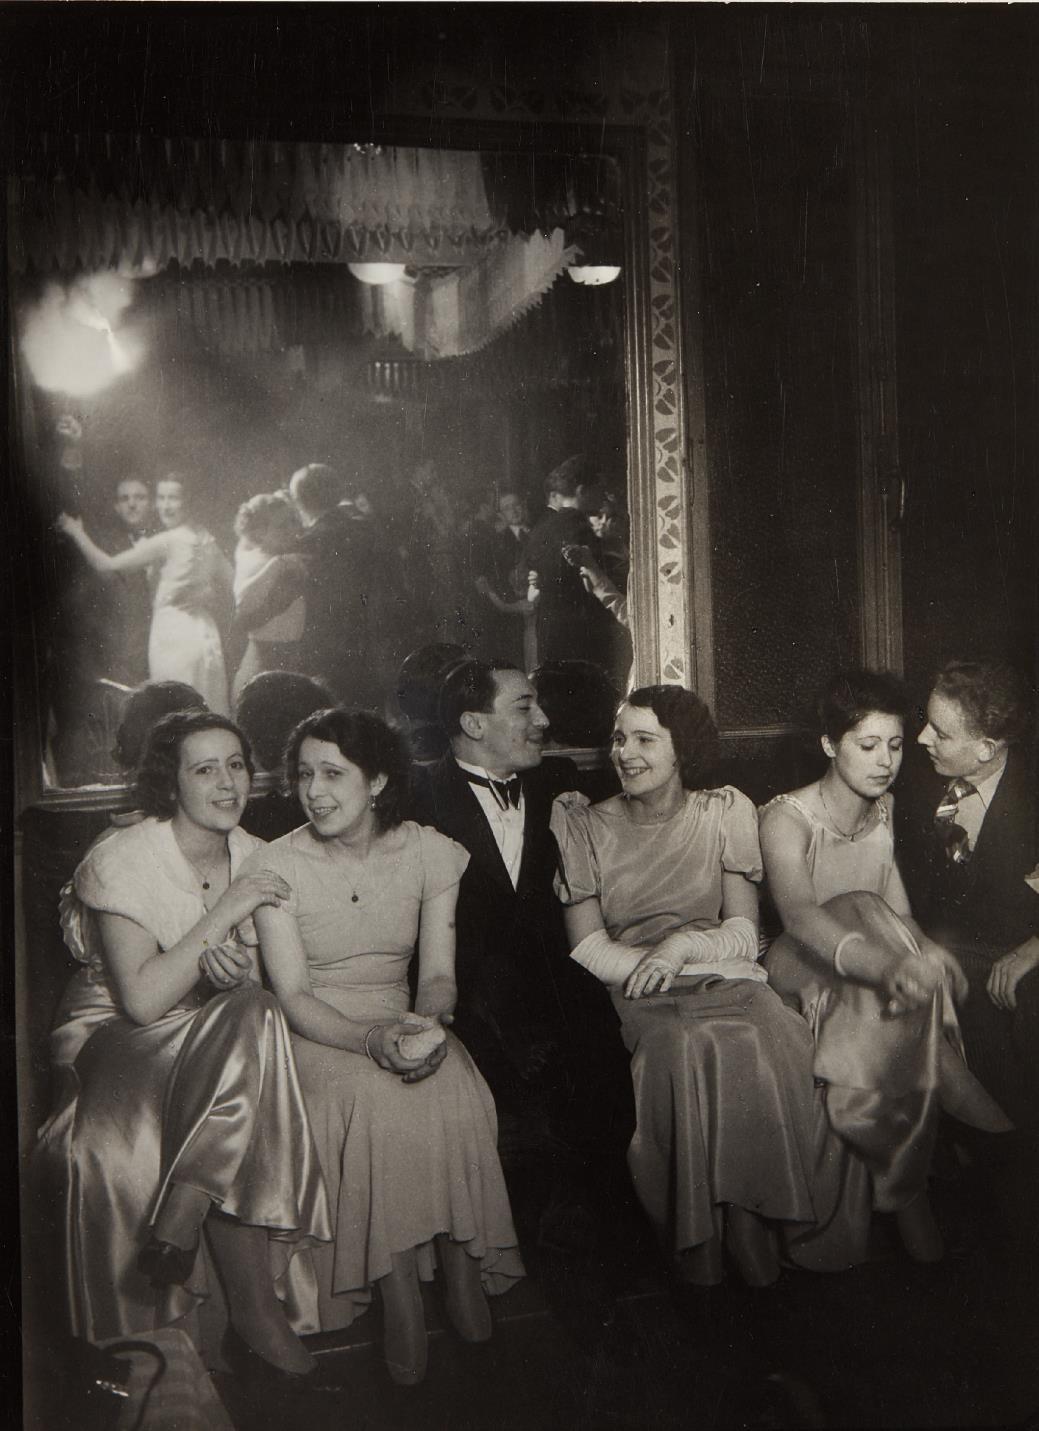 Brassai-Soirée At Chartres-1934